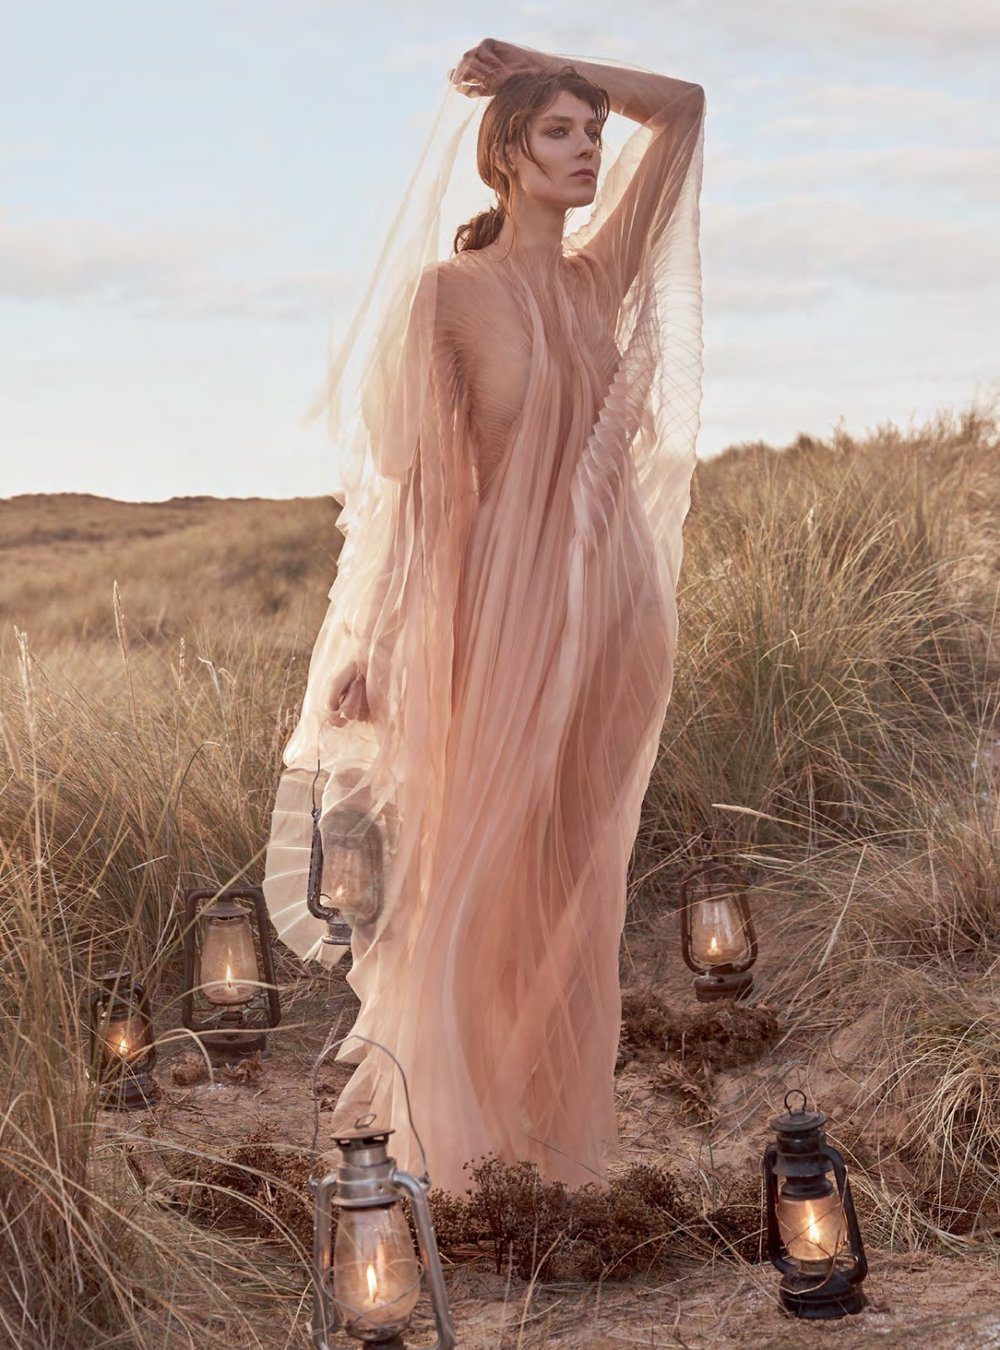 Kati Nescher by Richard Phibbs for Harper's Bazaar UK January 2019 (8).jpg